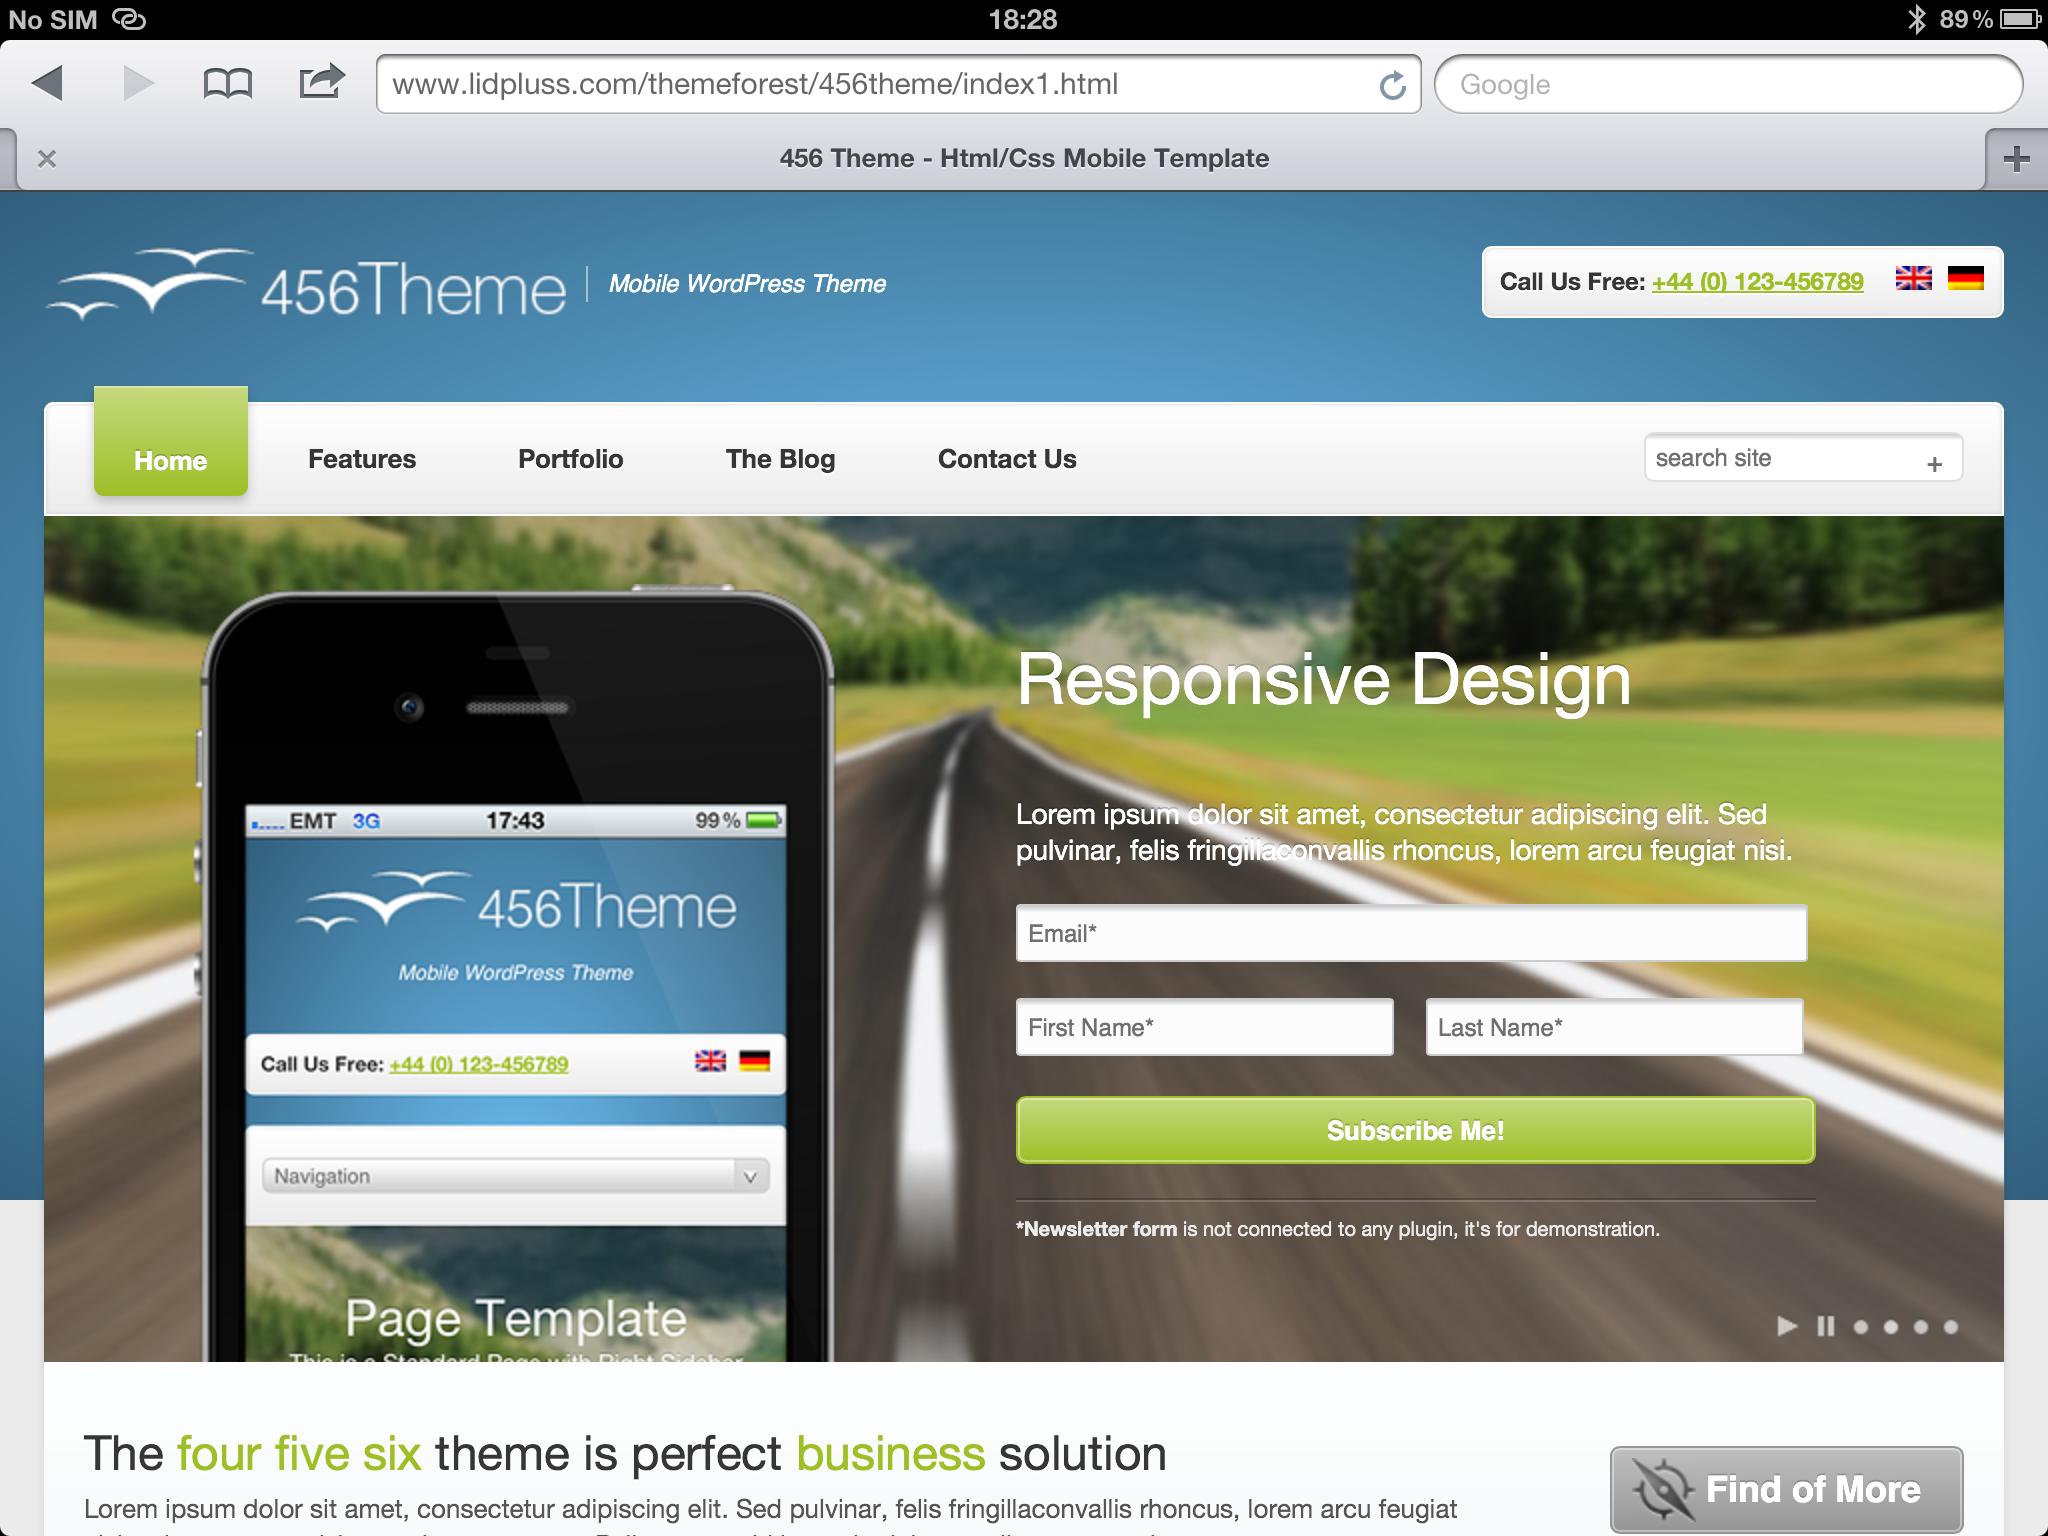 456Theme Premium Responsive Wordpress Theme - ipad front page